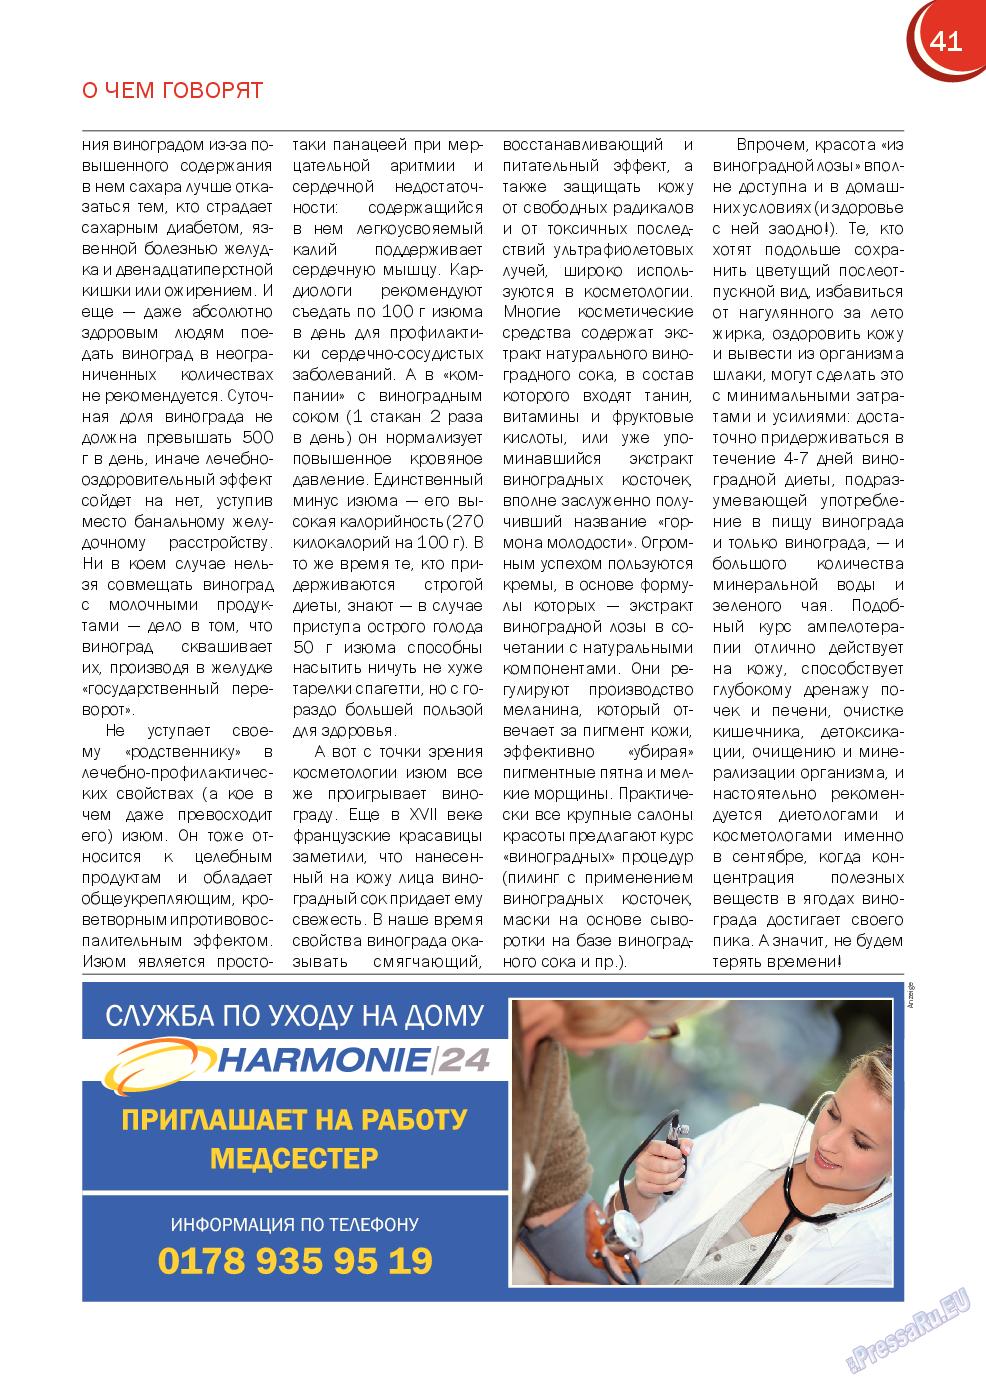 Русский Баден-Вюртемберг (журнал). 2014 год, номер 43, стр. 41